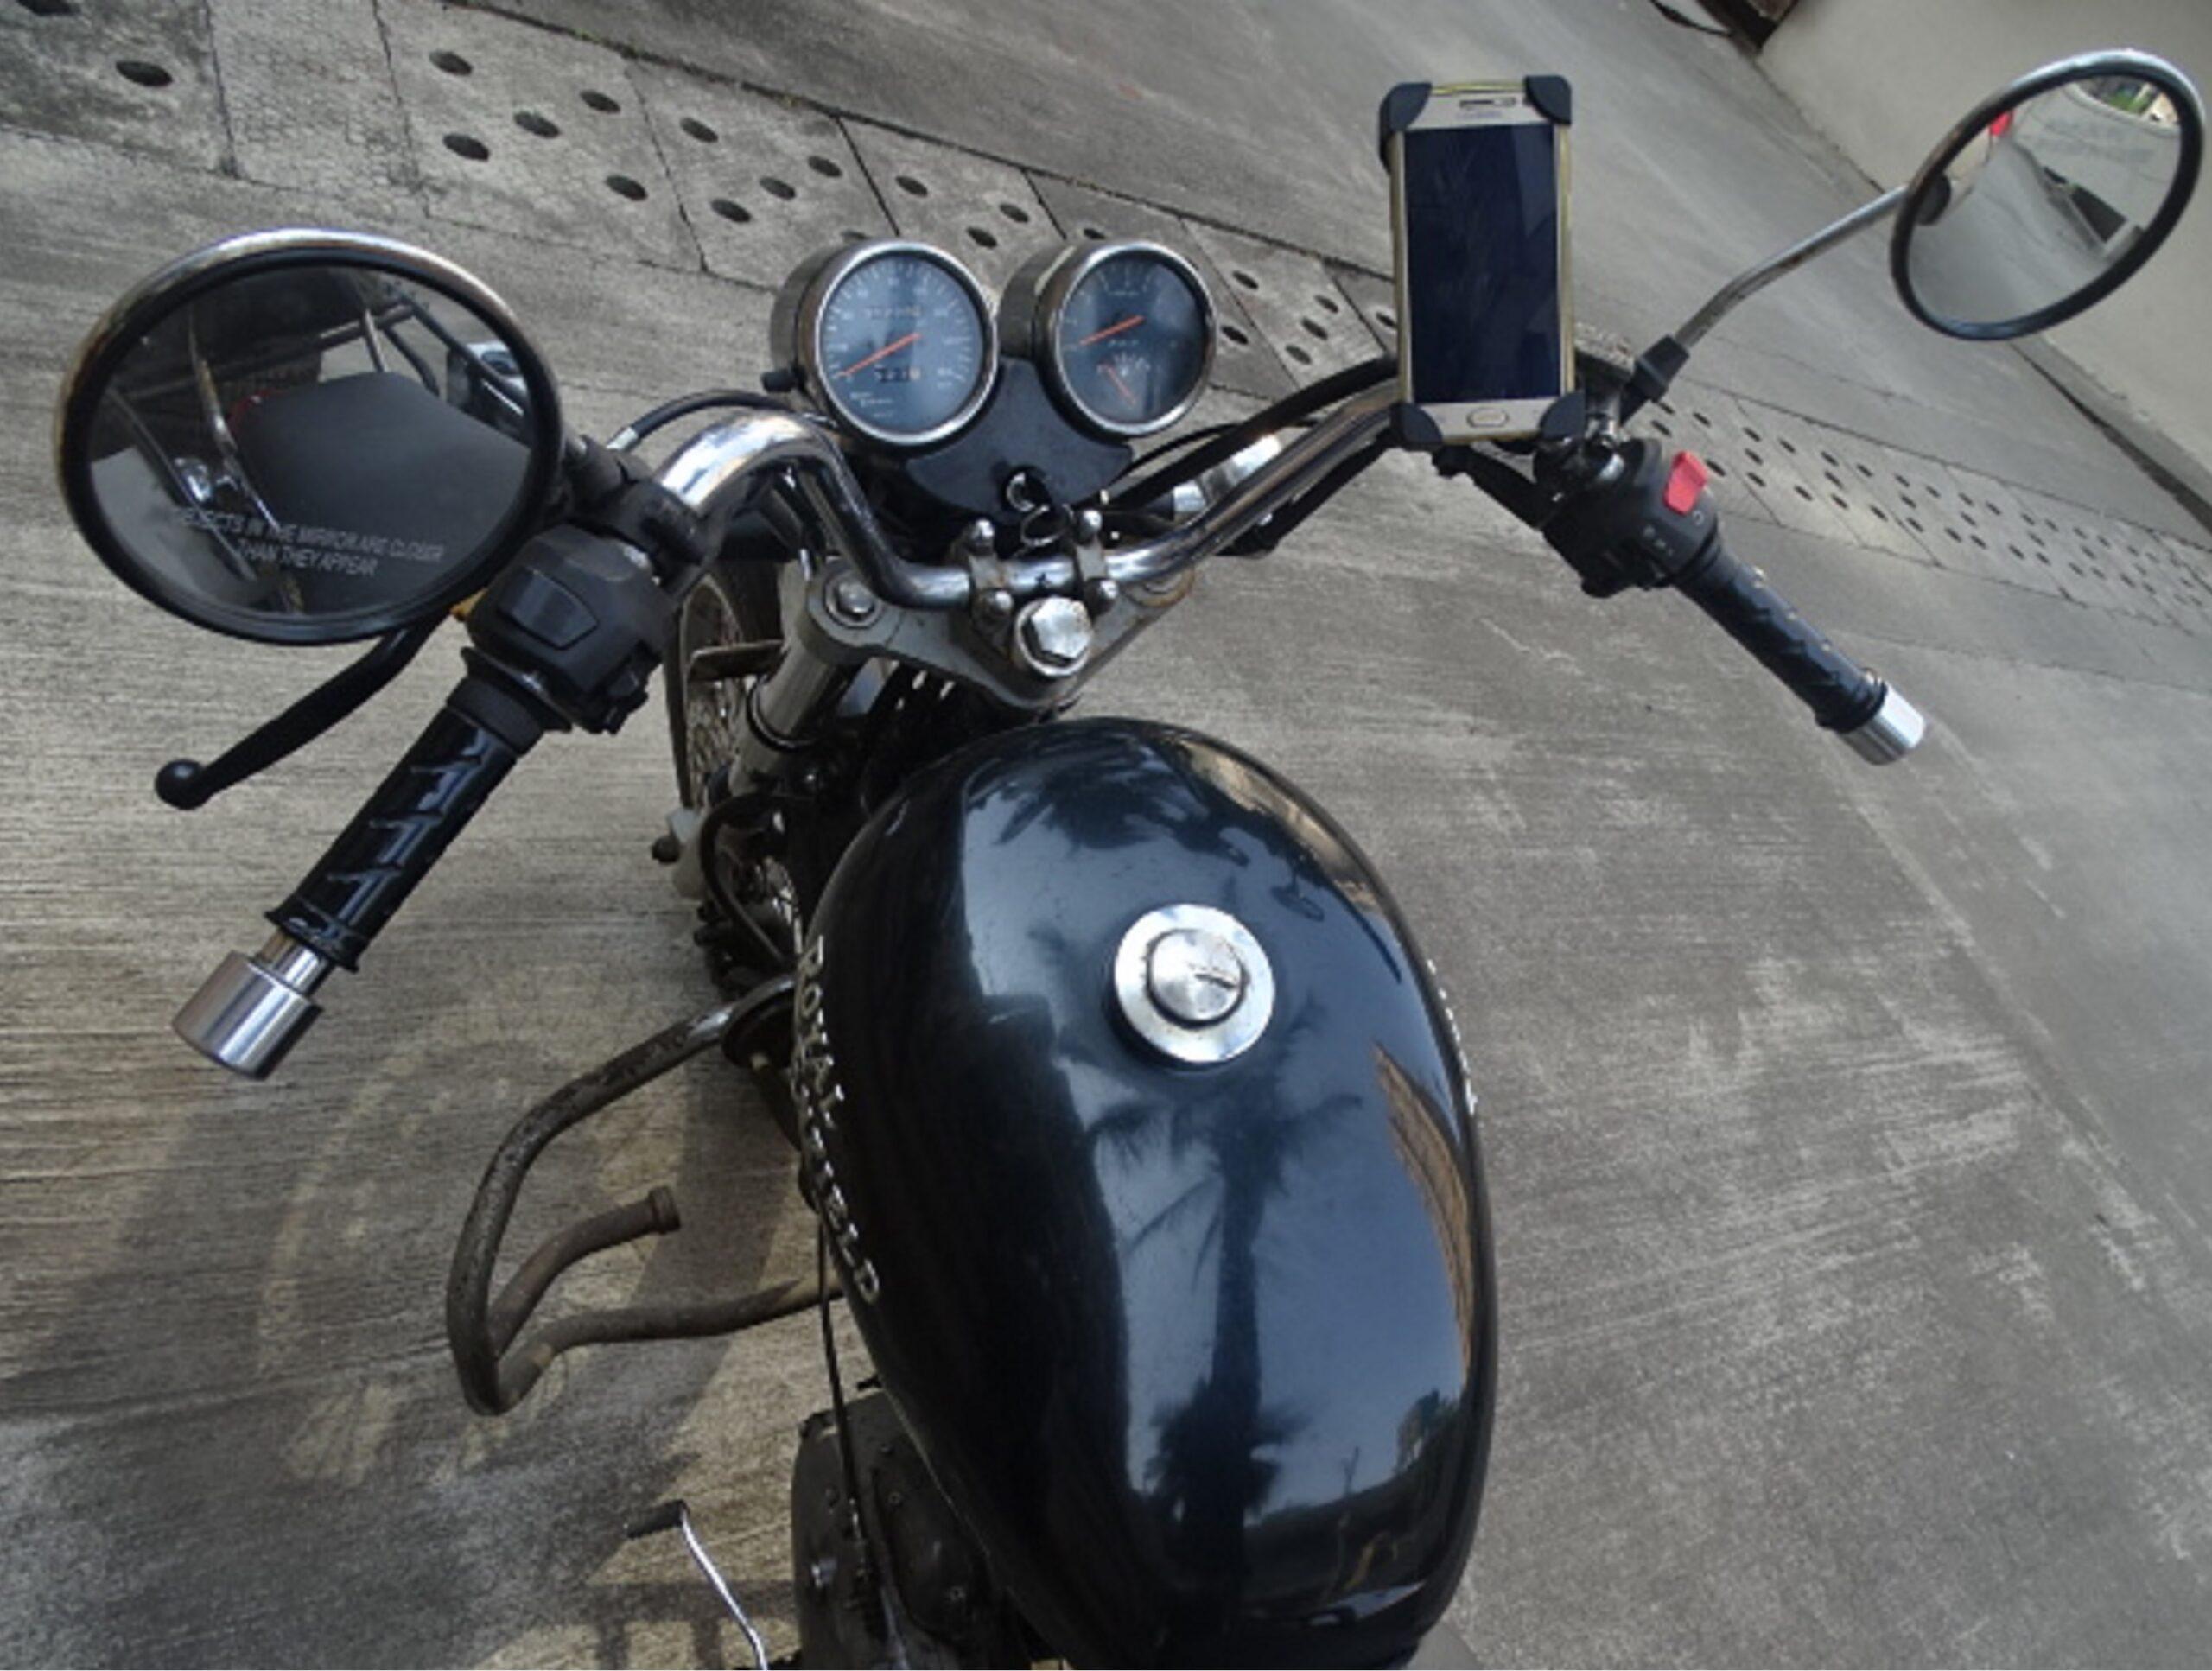 Glito Bike Mobile Phone Holder - RE Thunderbird Twinspark 350